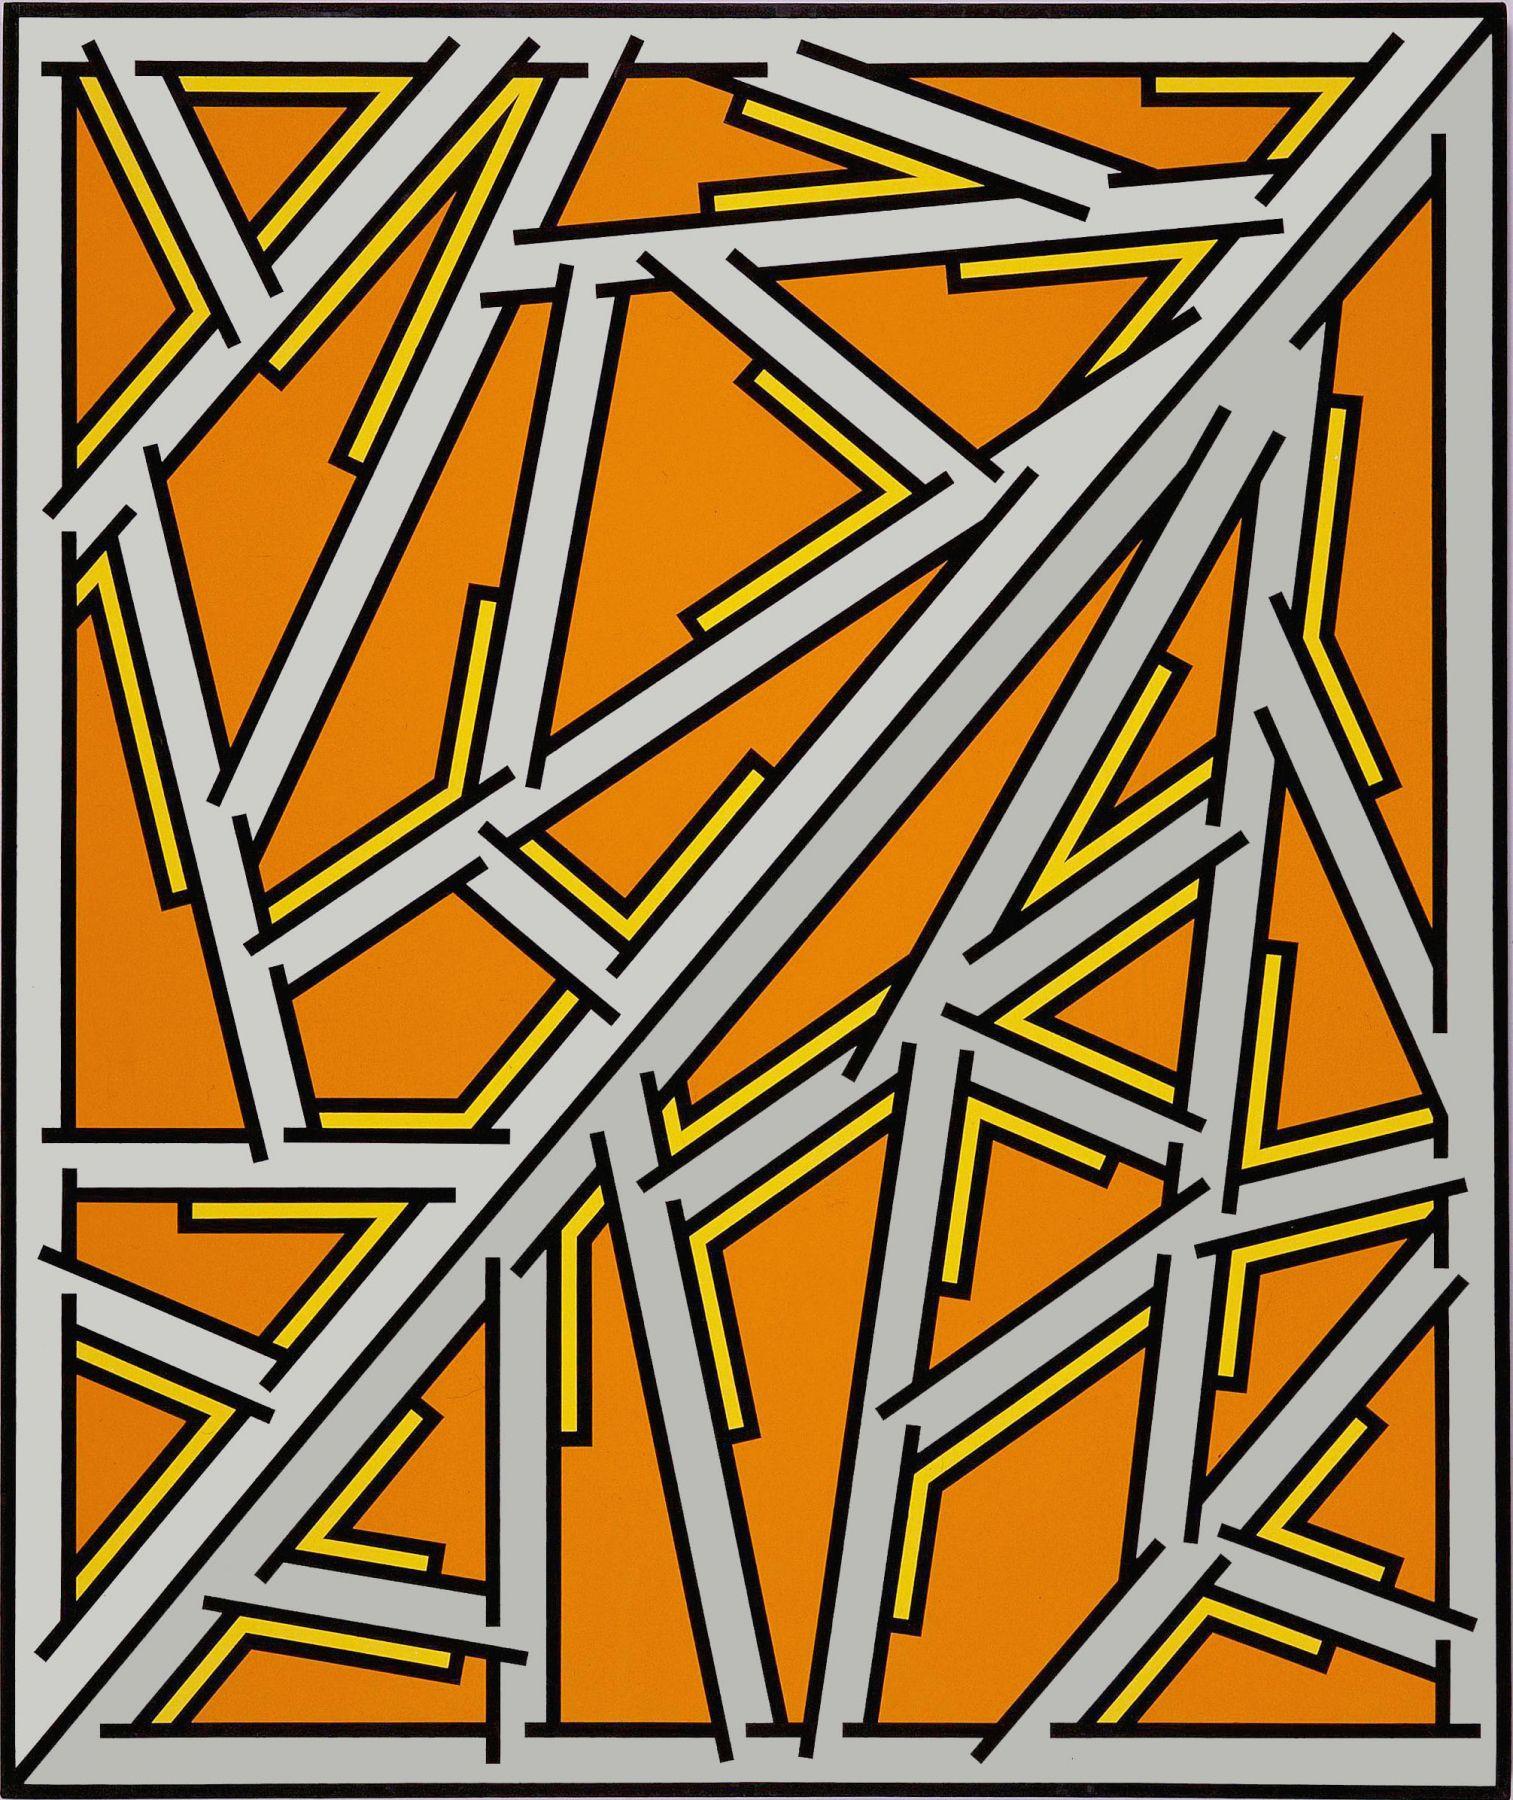 Untitled #14, 1977, Acrylic on linen